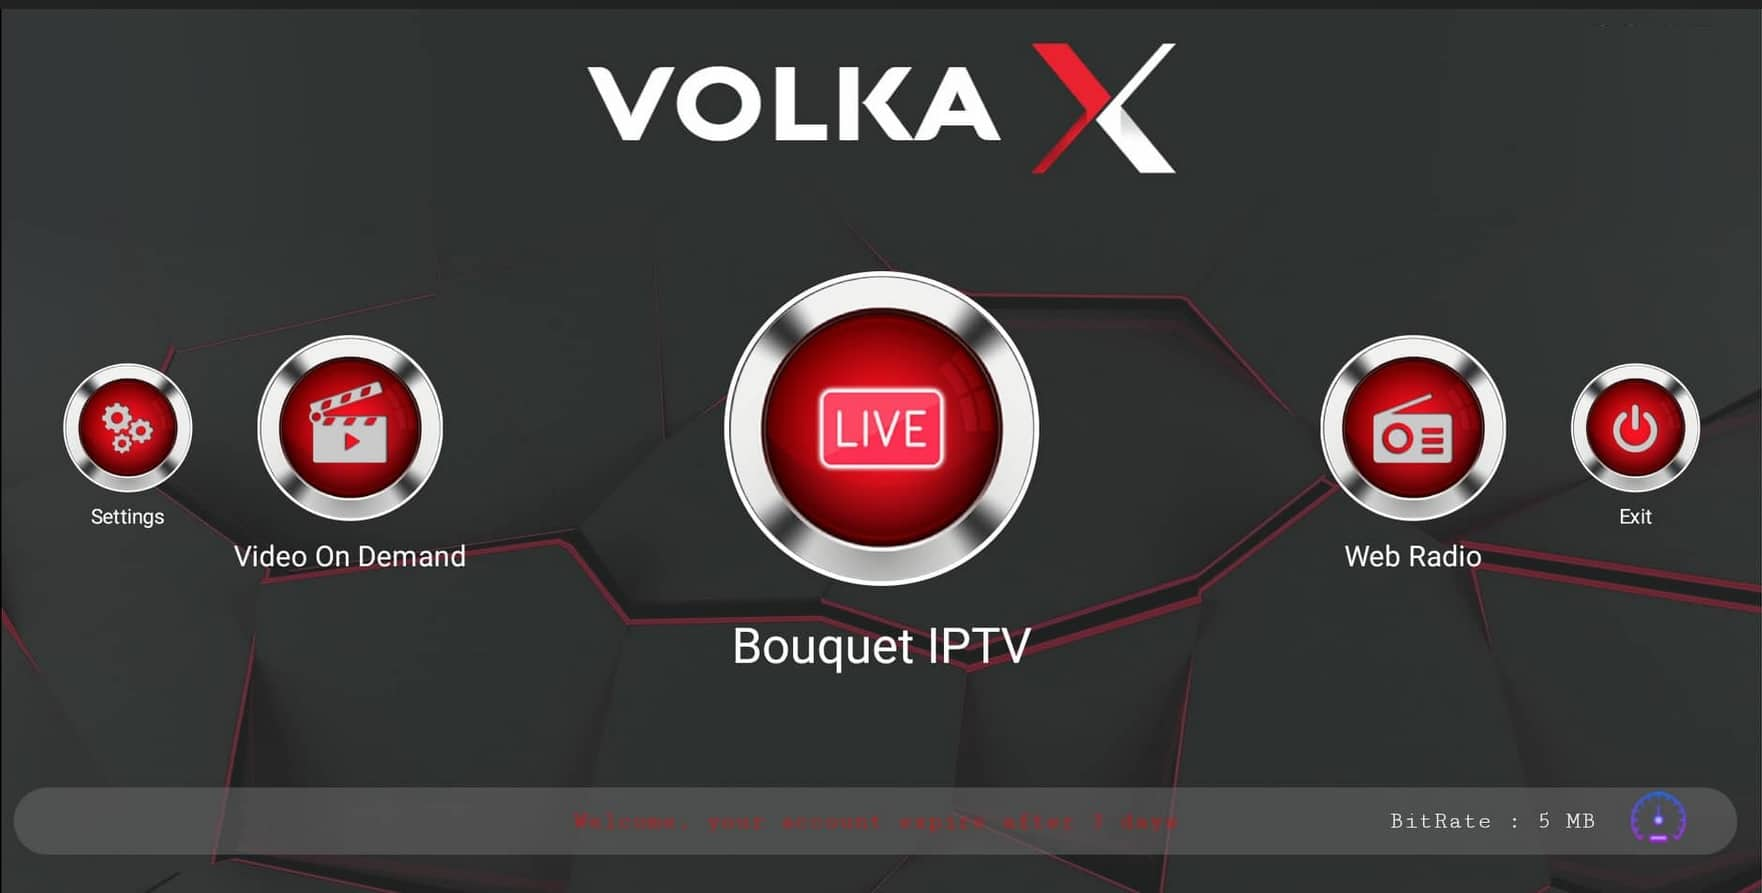 Volka IPTV